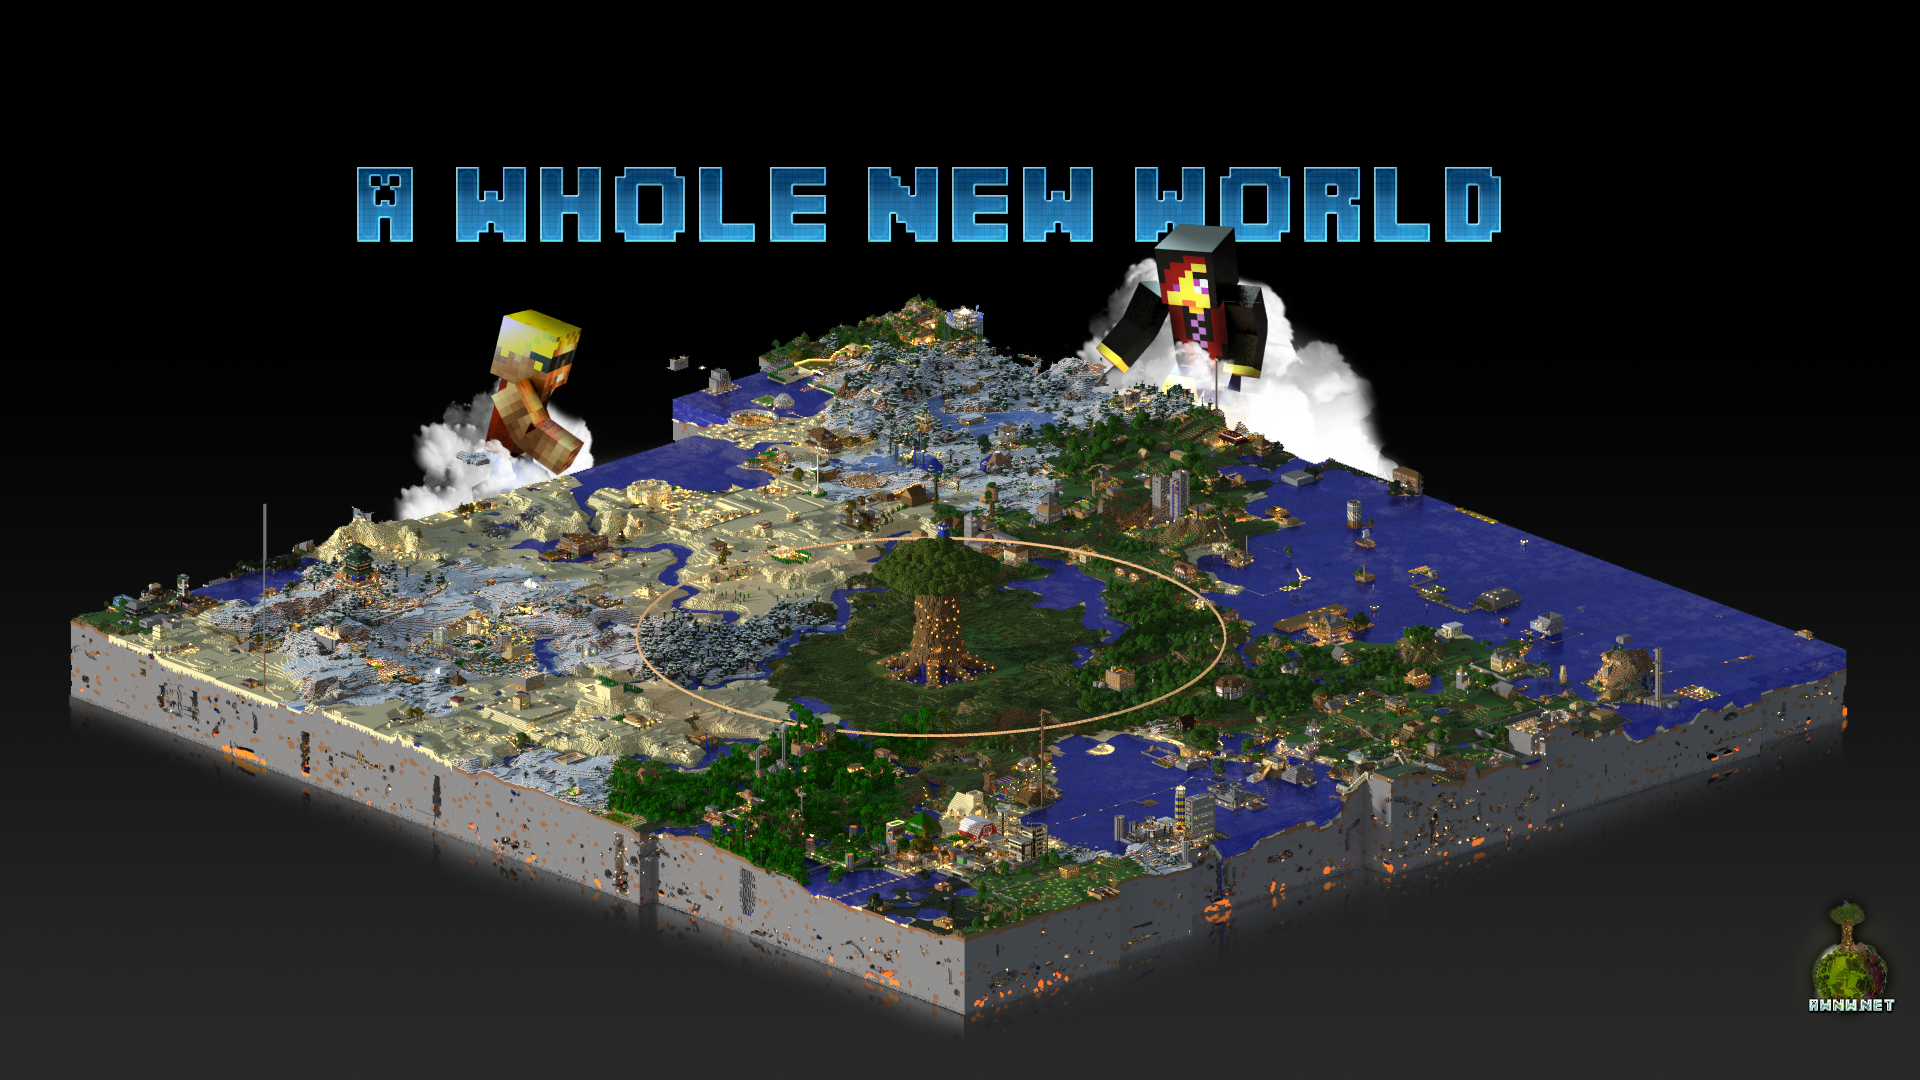 Great Wallpaper Minecraft Fox - awnw_net_map_wallpaper_by_foxgguy2001-d5yxti8  Gallery_401097.png